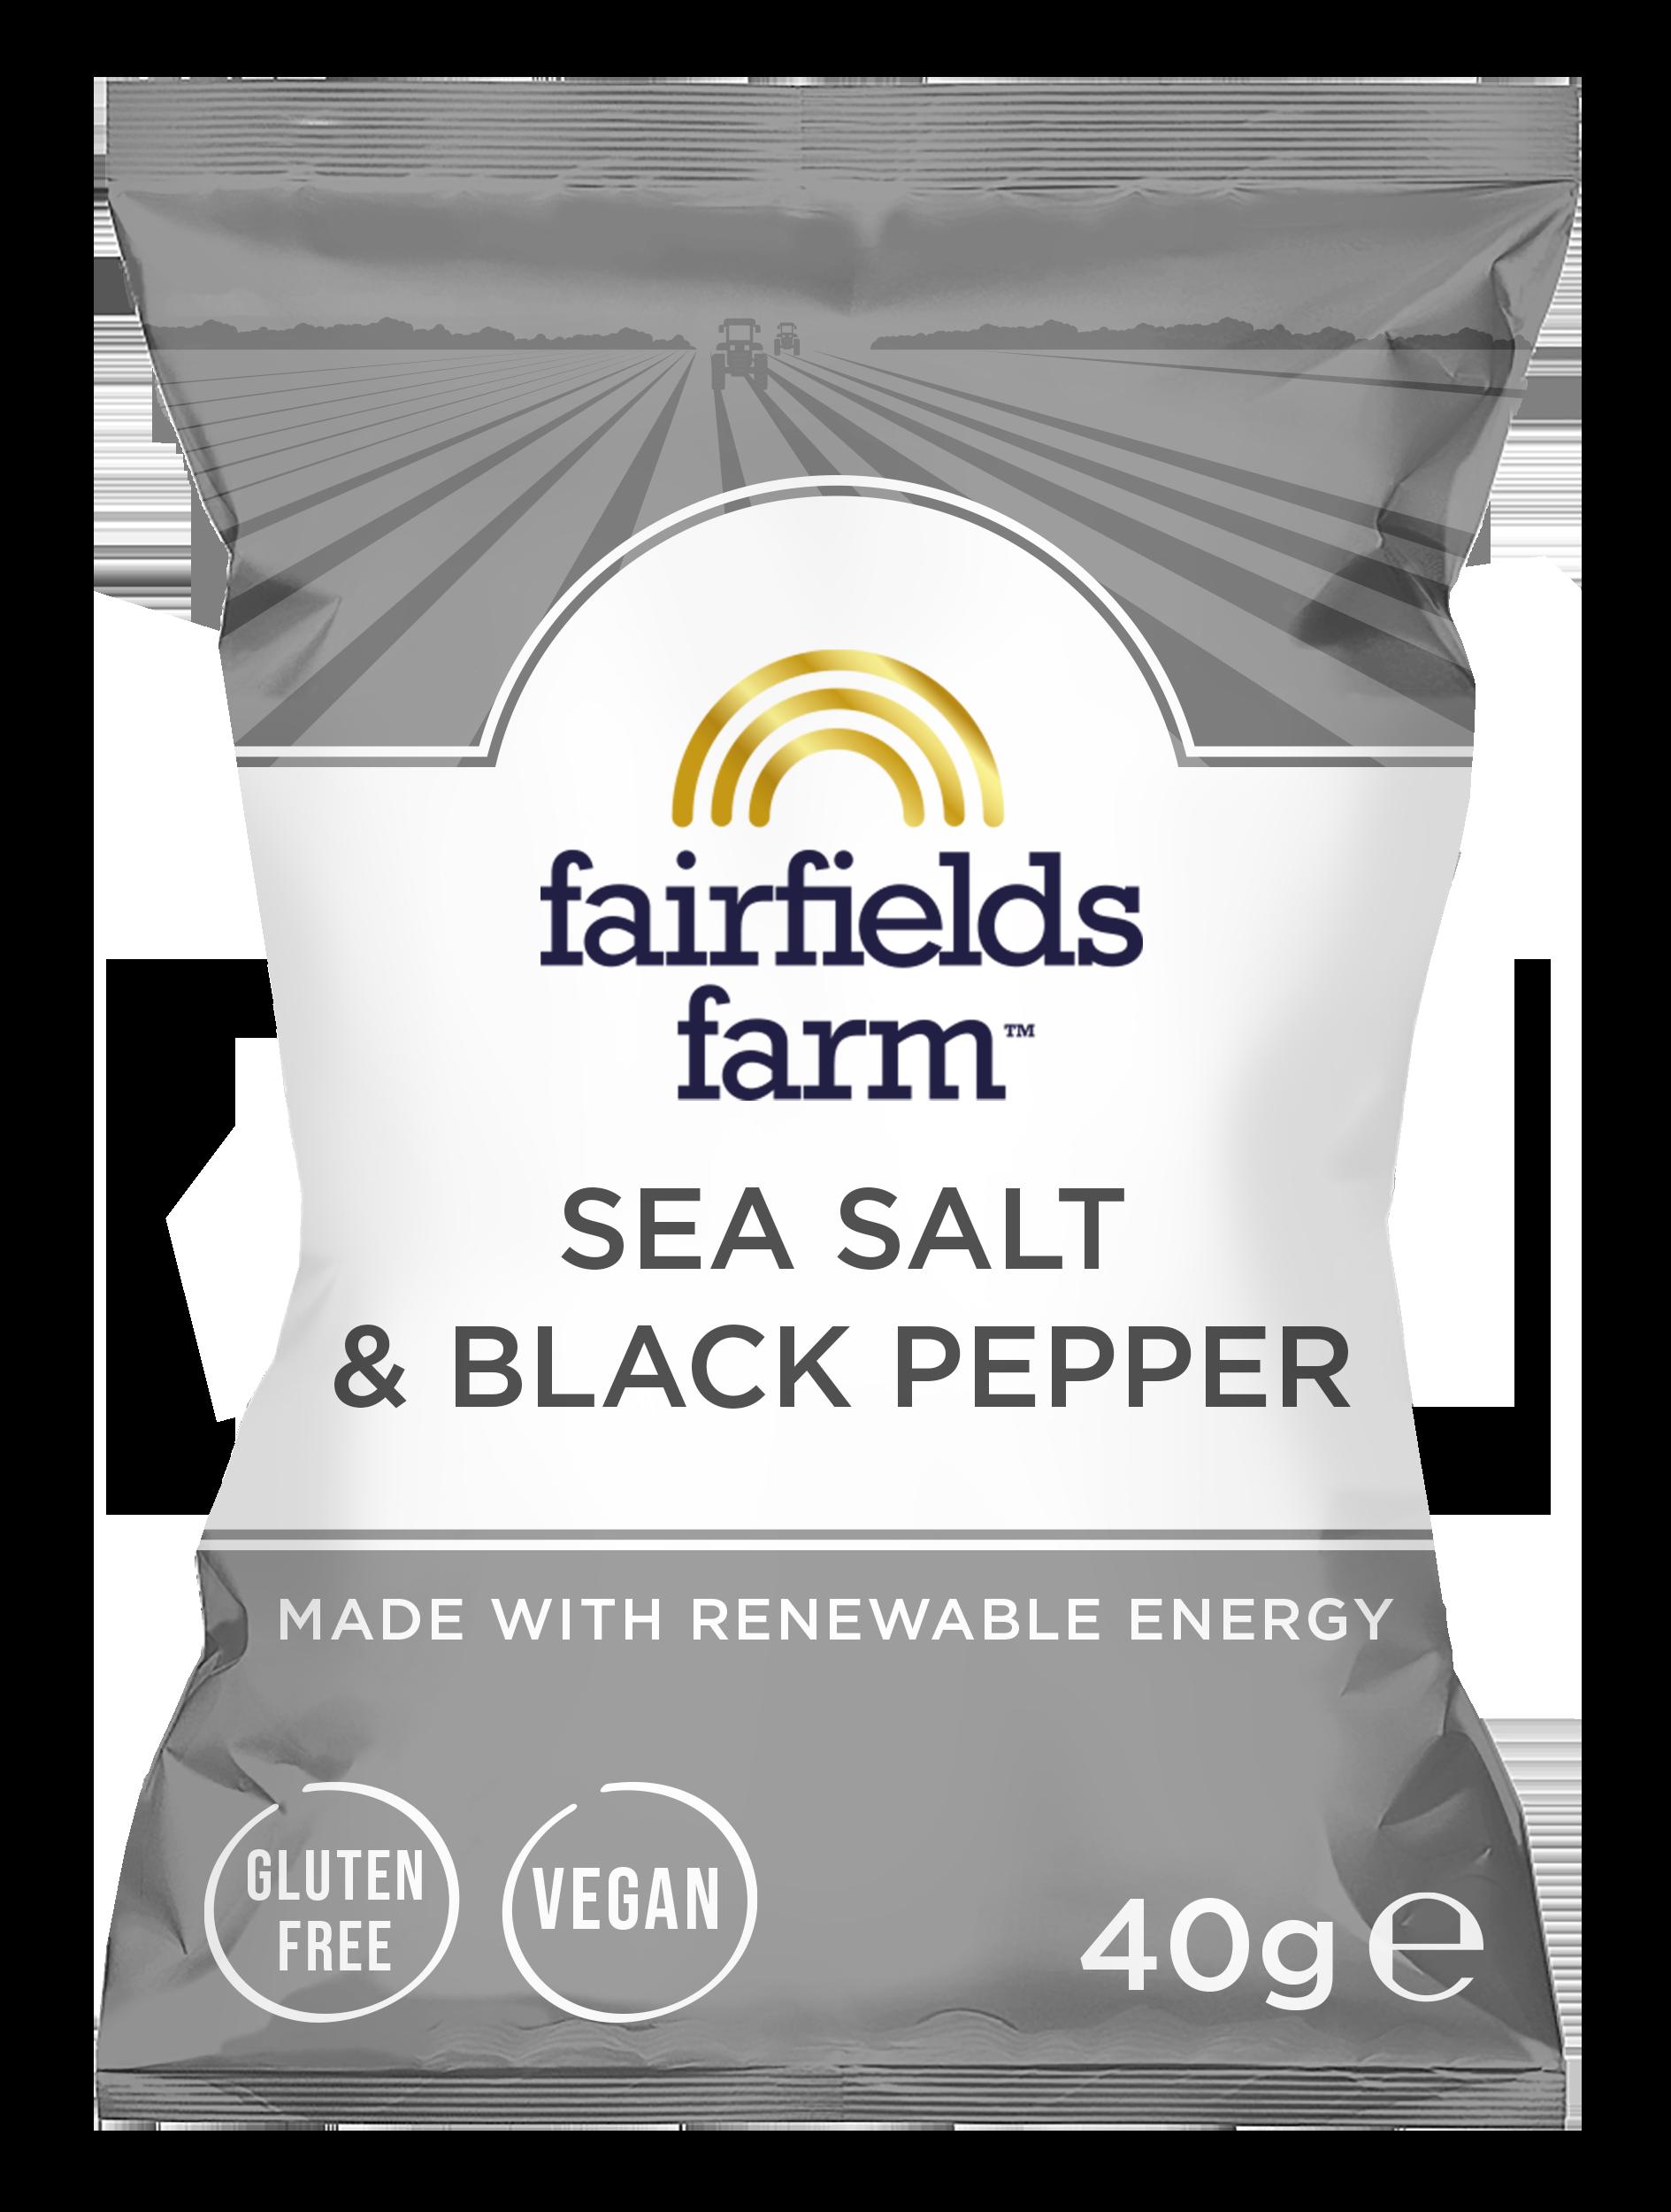 Fairfields 24 x 40g Bags – Sea Salt & Black Pepper